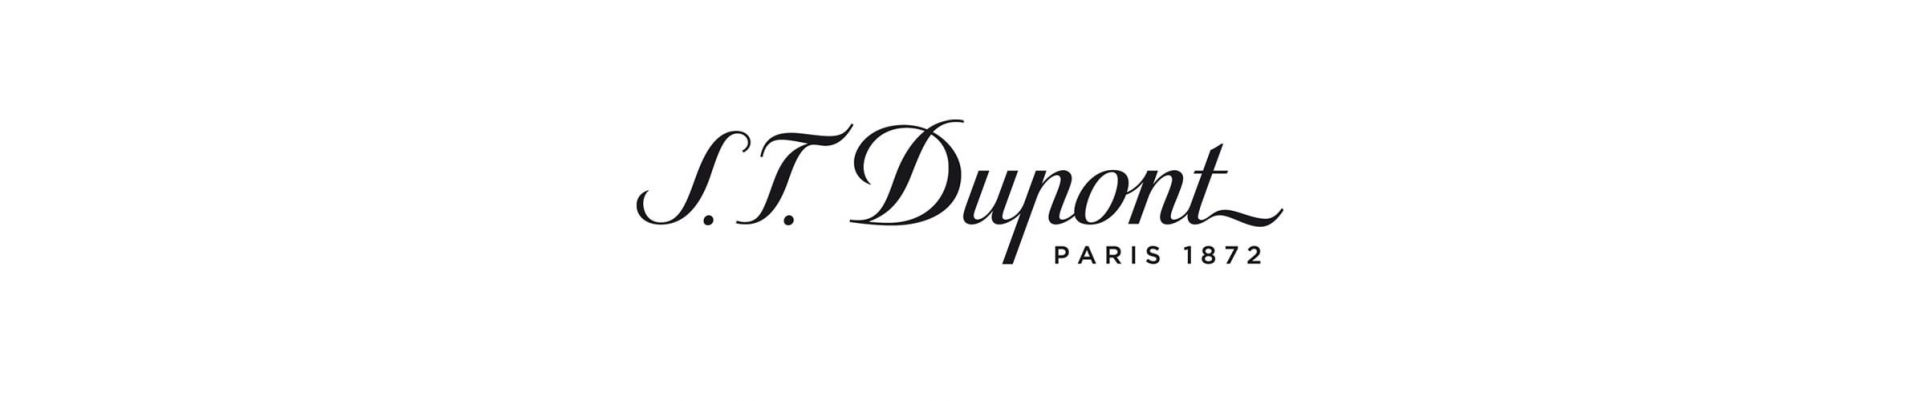 Bricheta S.T. Dupont Brichete S.T. Dupont Bricheta Dupont de vanzare.Magazin oficial ST Dupont la cele mai bune preturi.